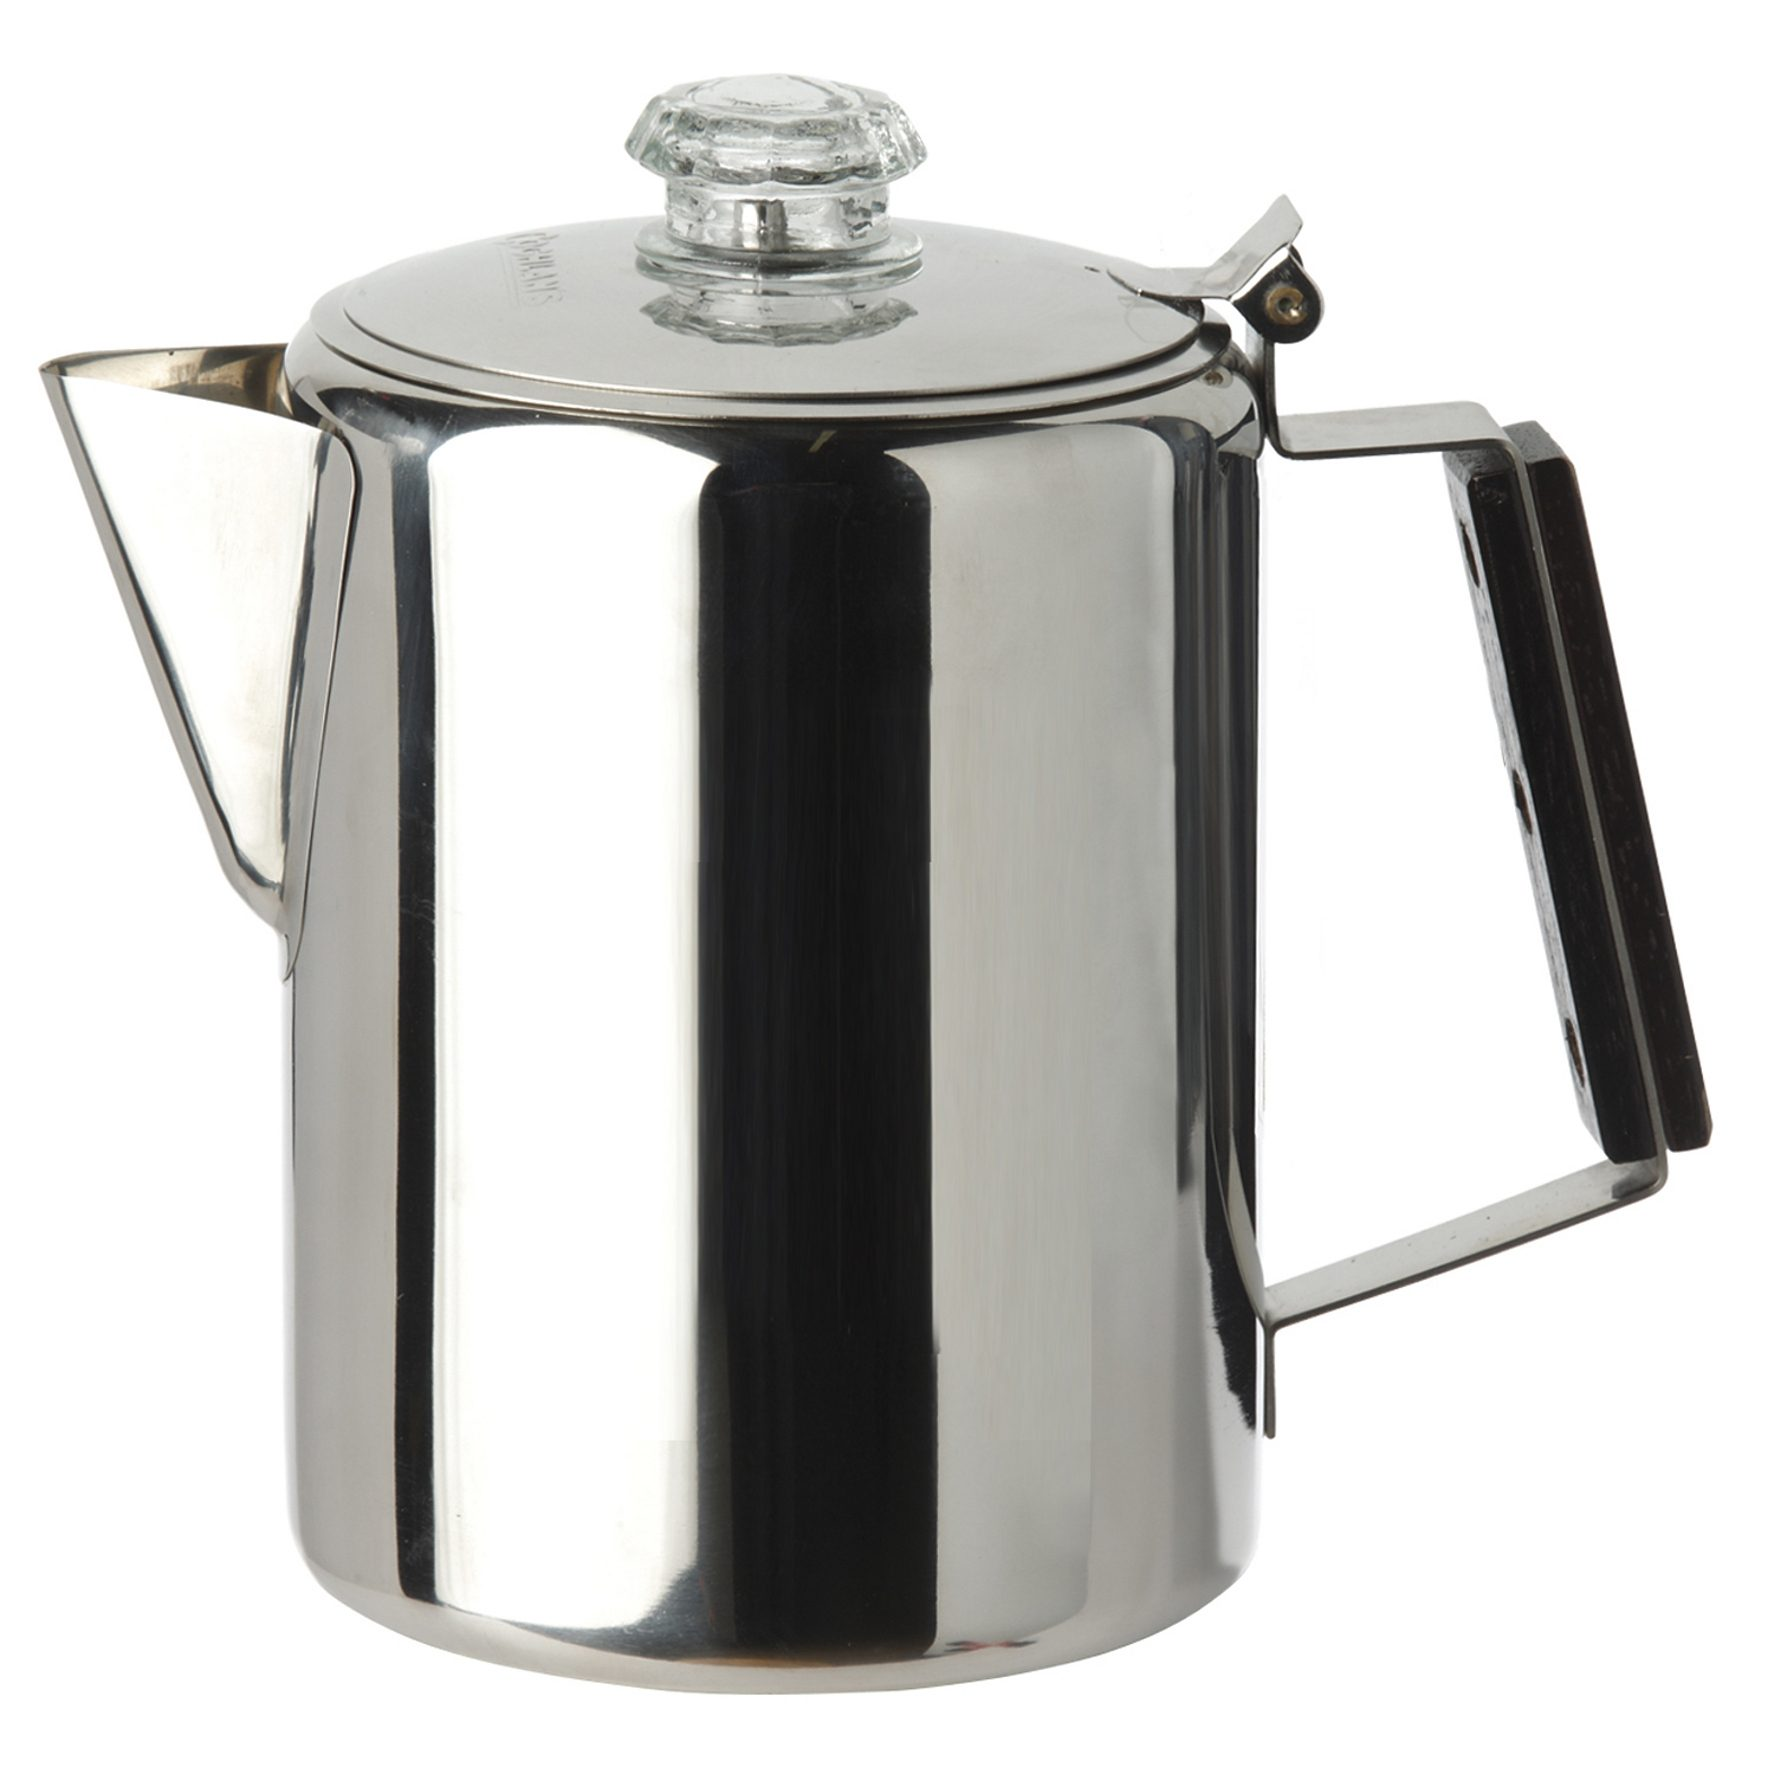 Coghlans Camping-Geschirr »Coffee Pot Edelstahlkanne 9 Tassen«